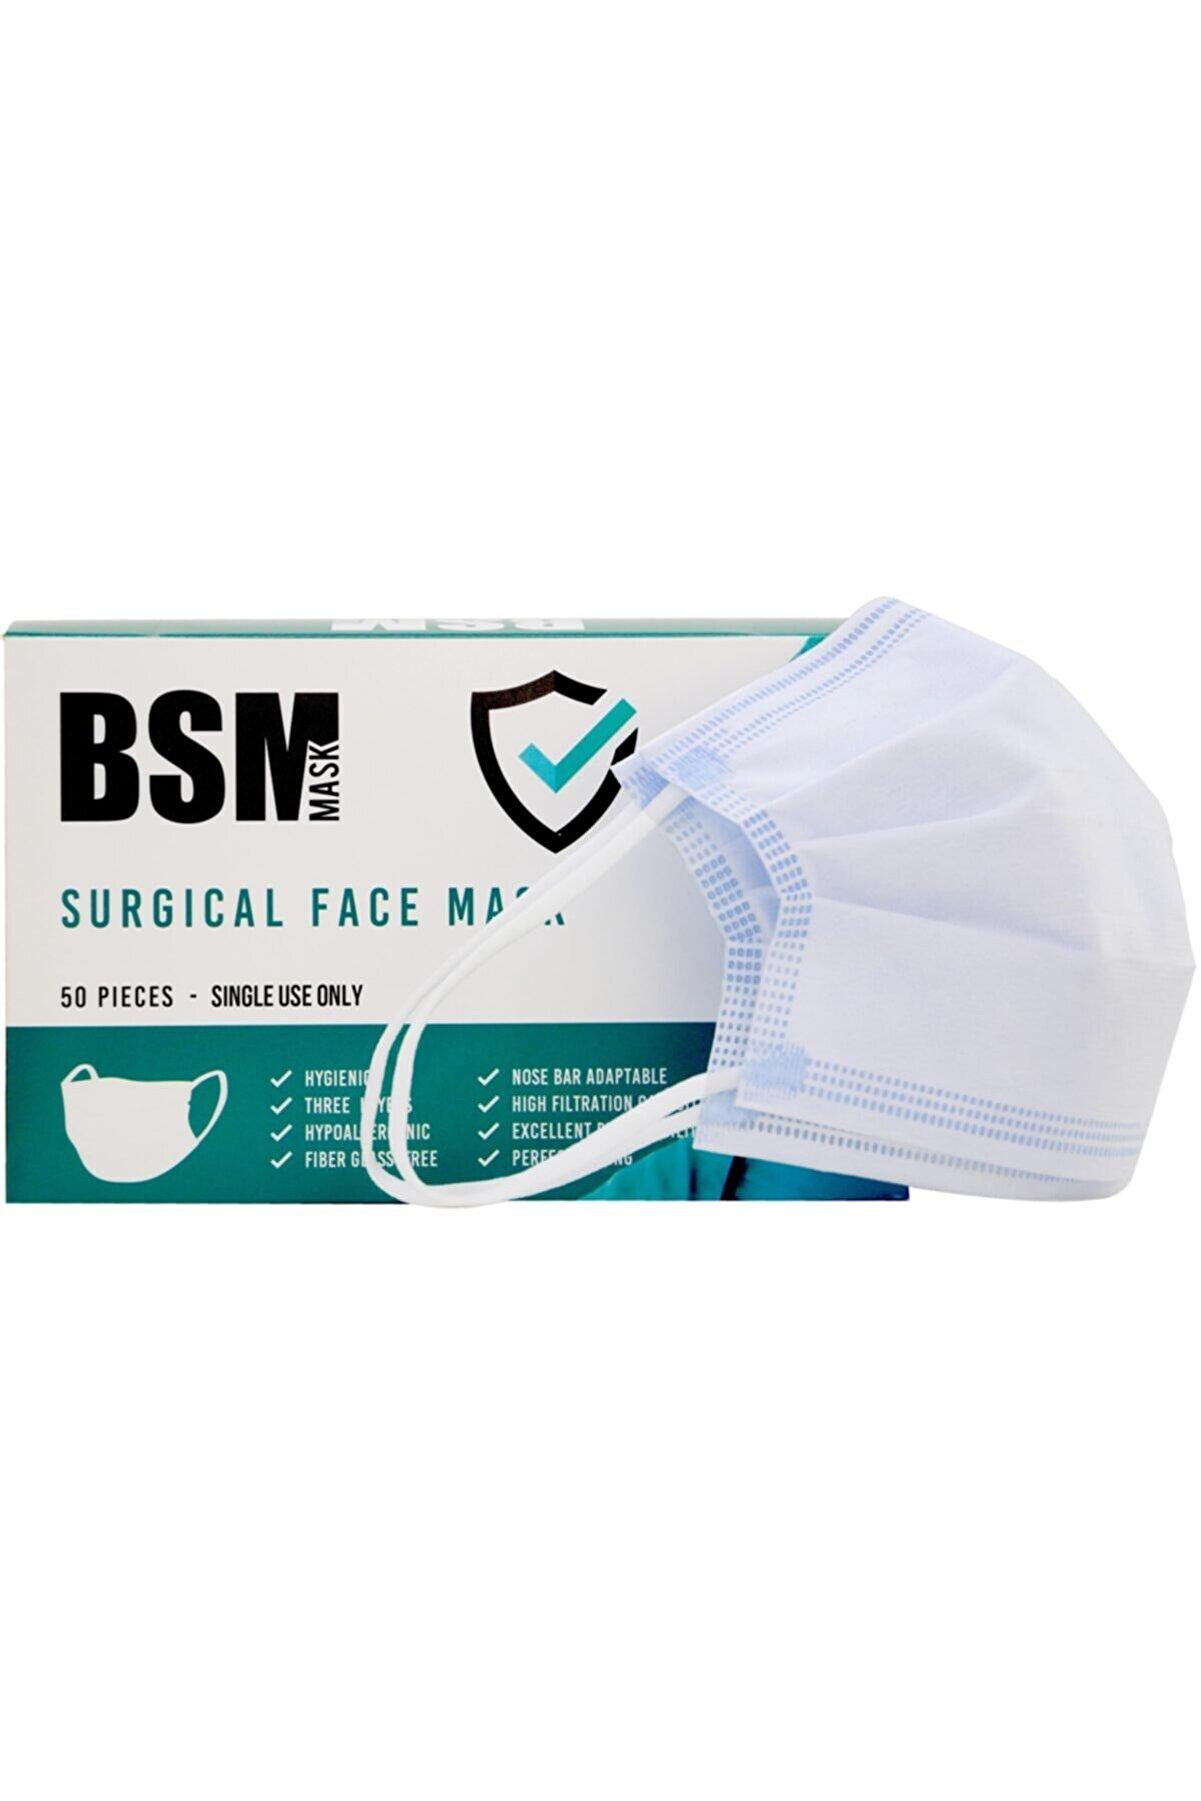 BSM Mavi 3 Katlı Yassı Lastikli Meltblown Cerrahi Maske Toplam 50 Adet